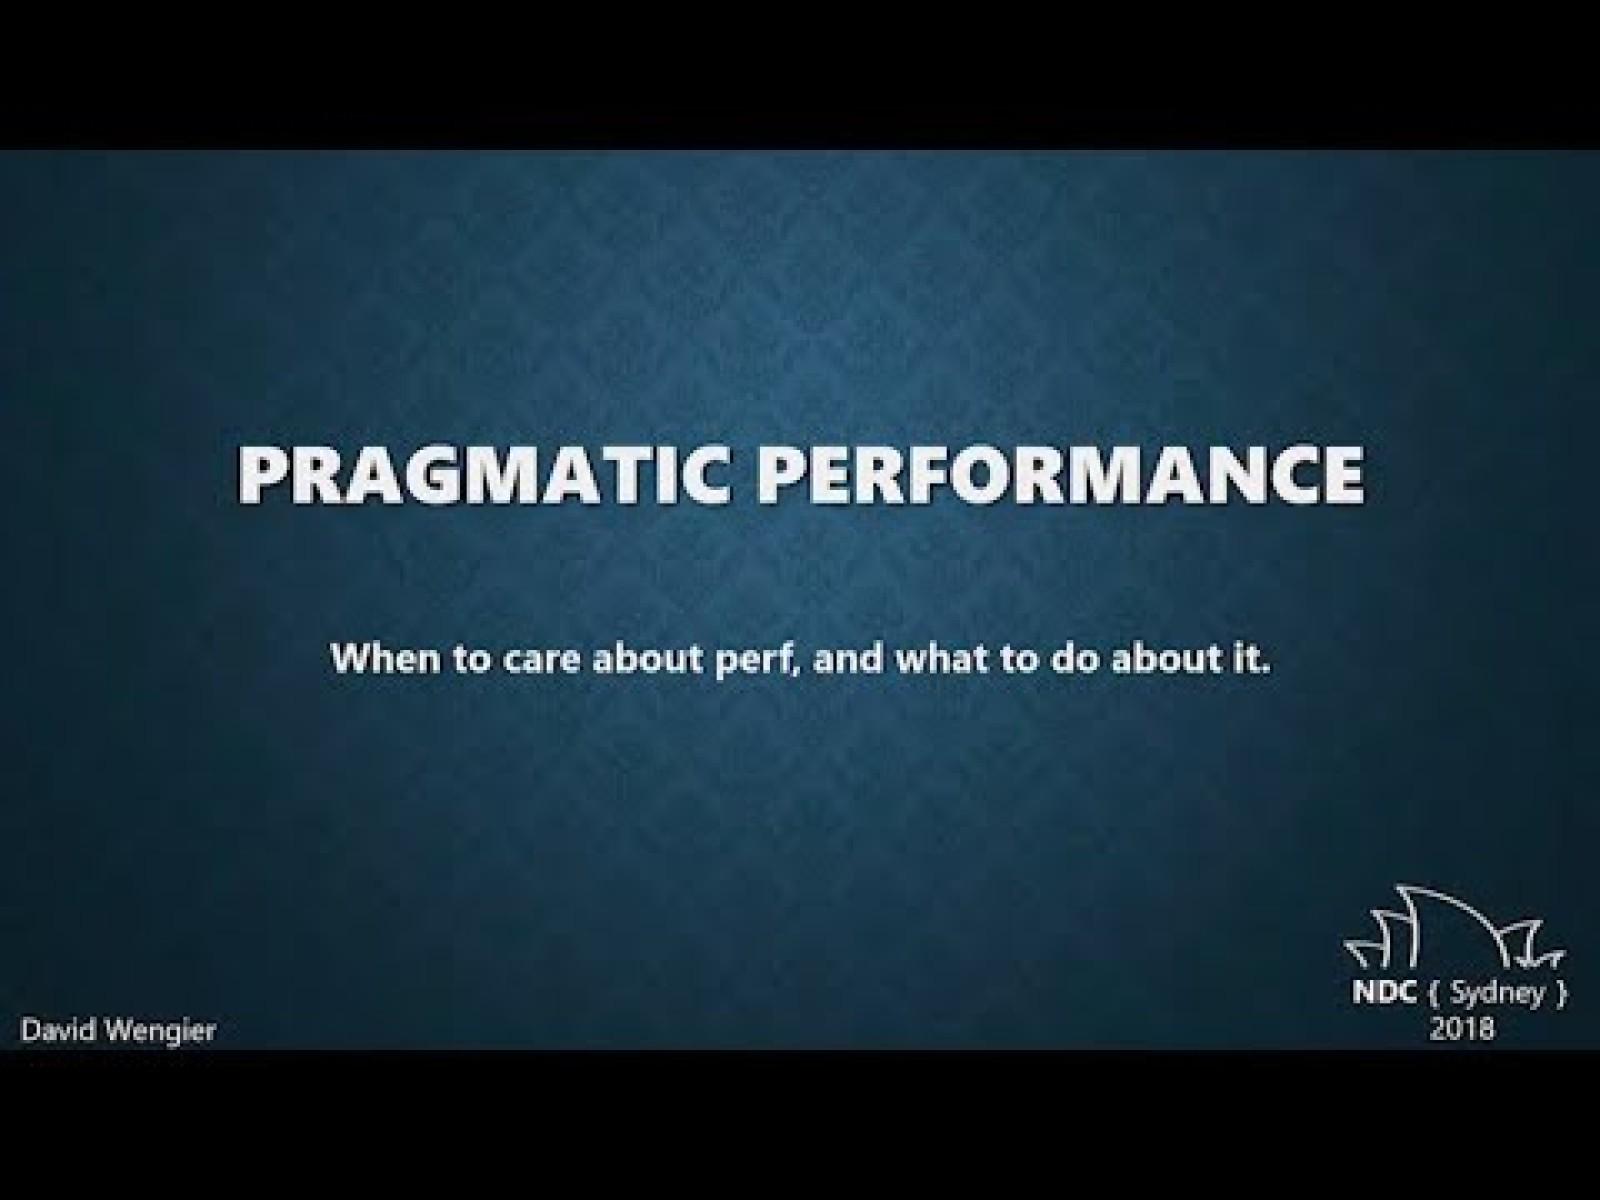 Pragmatic Performance